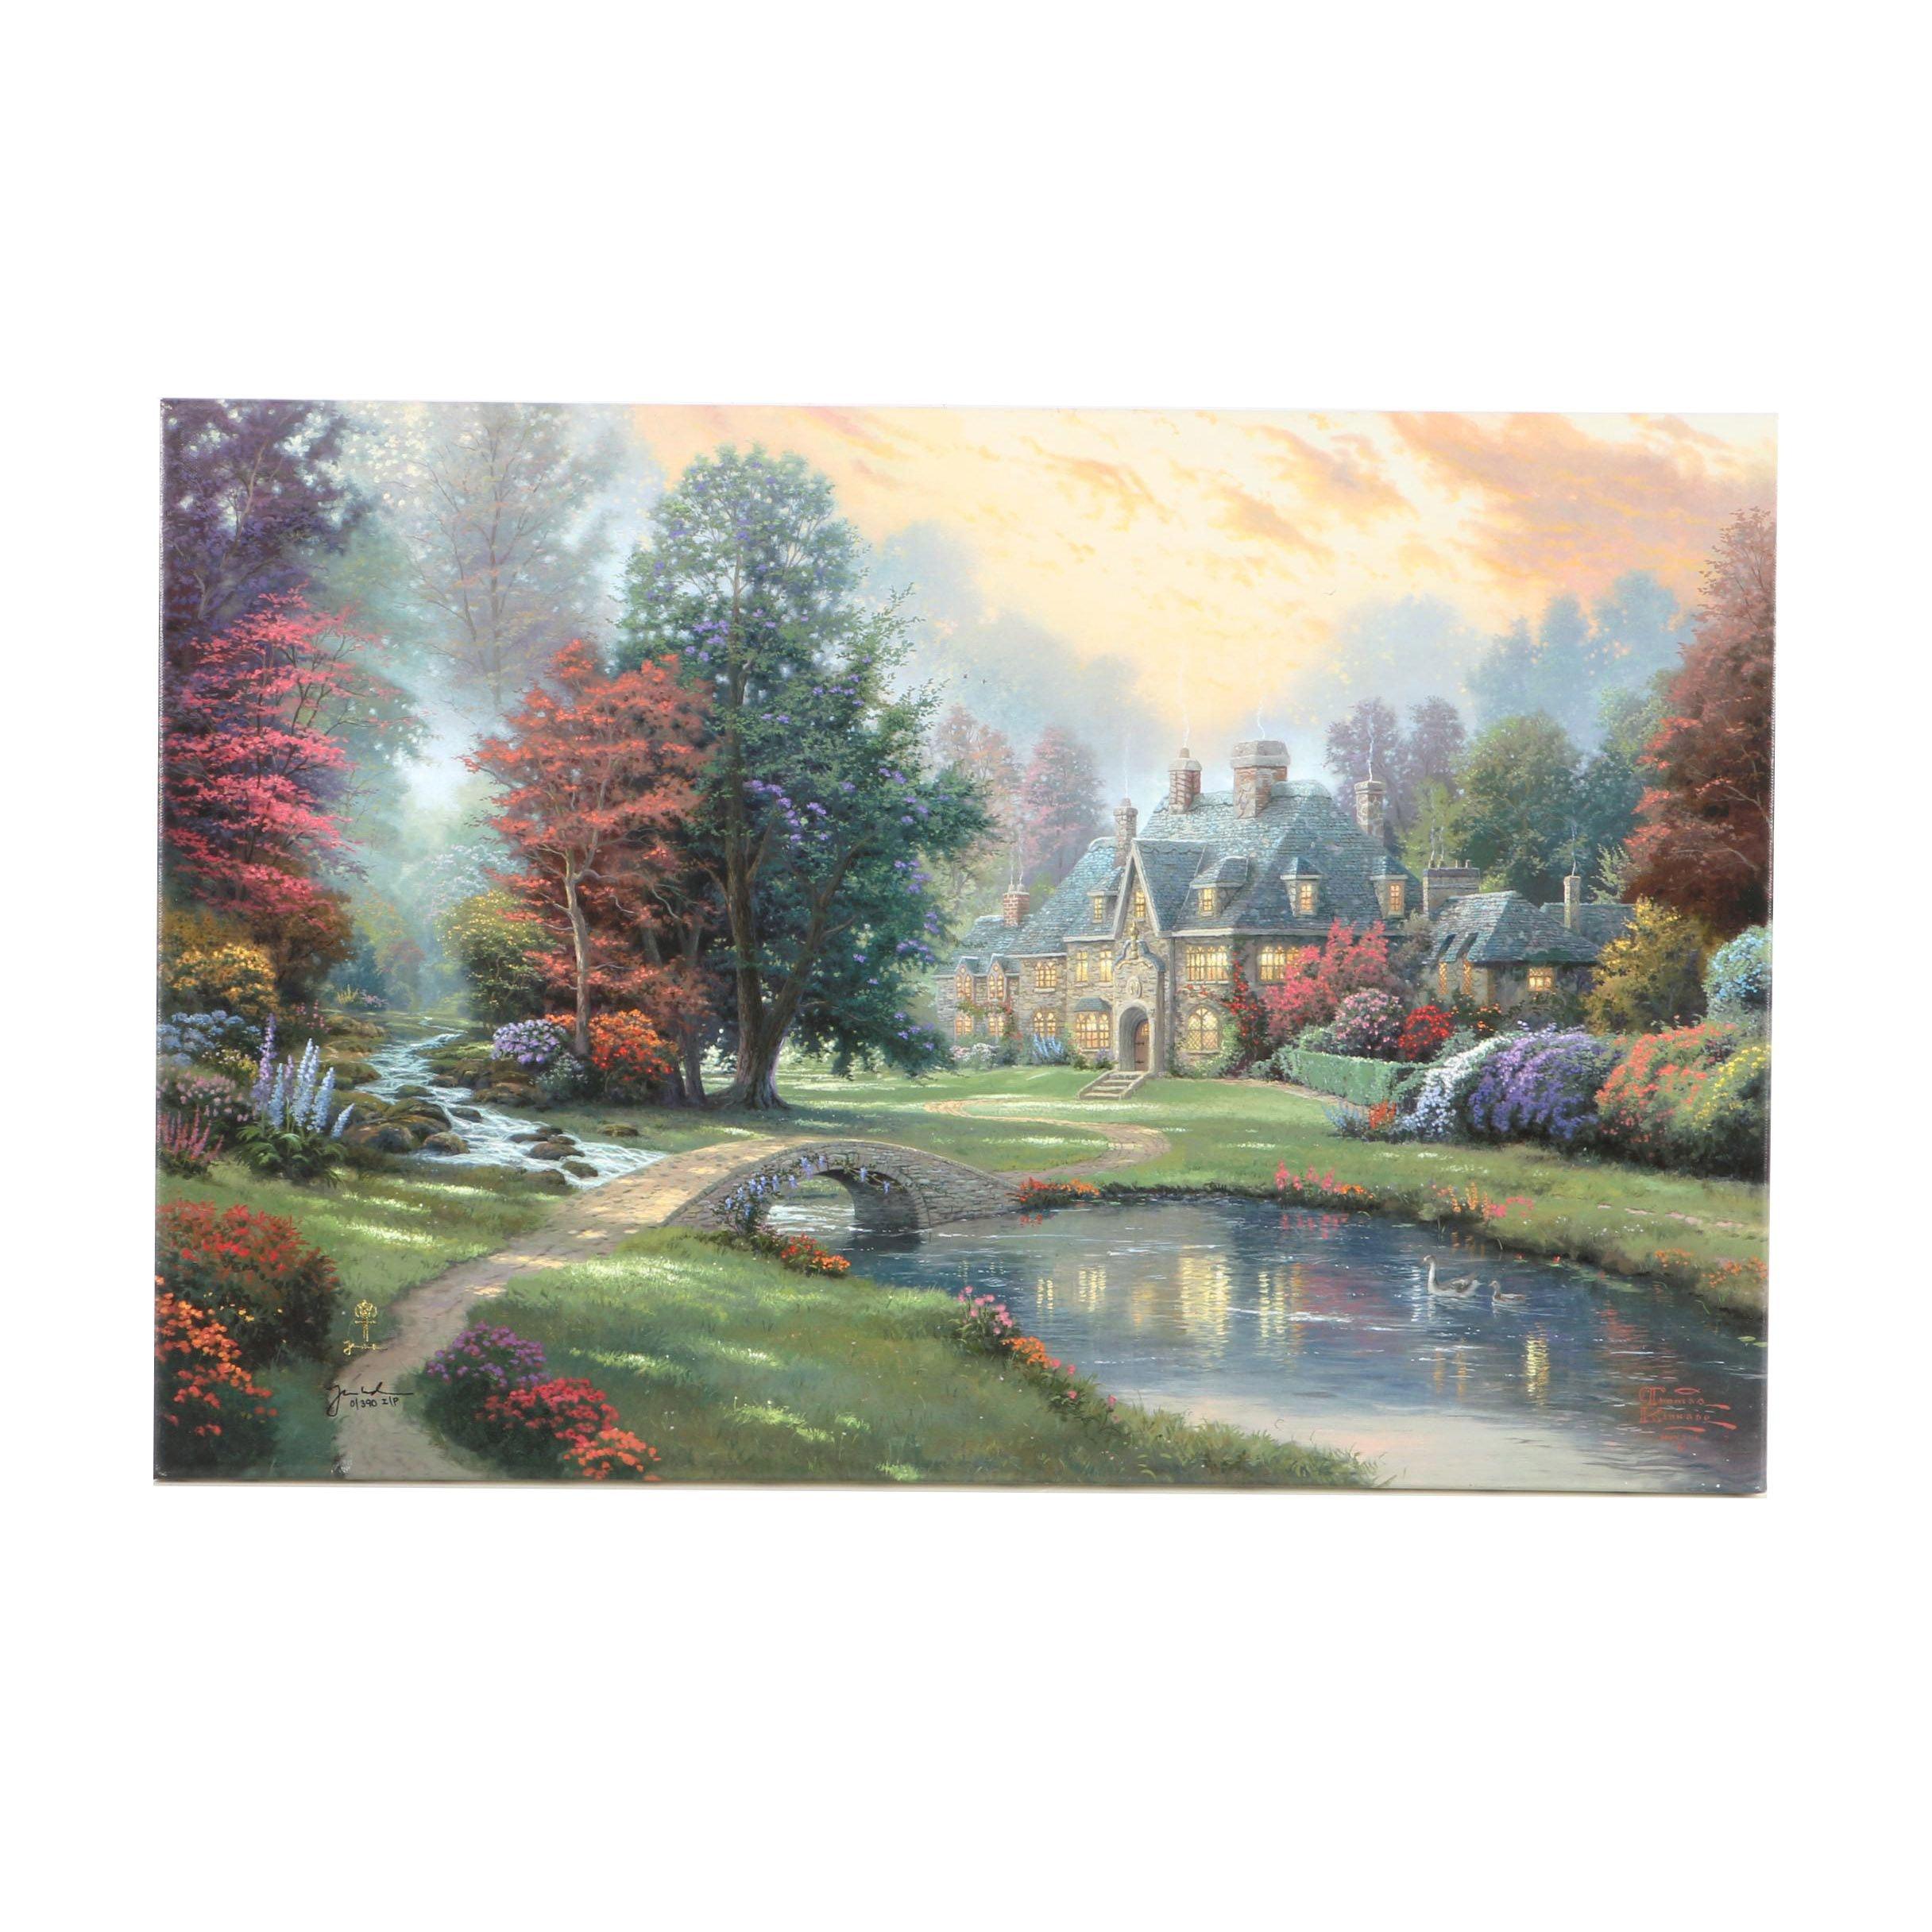 "Thomas Kinkade Limited Edition Giclee on Canvas ""Lakeside Manor"""